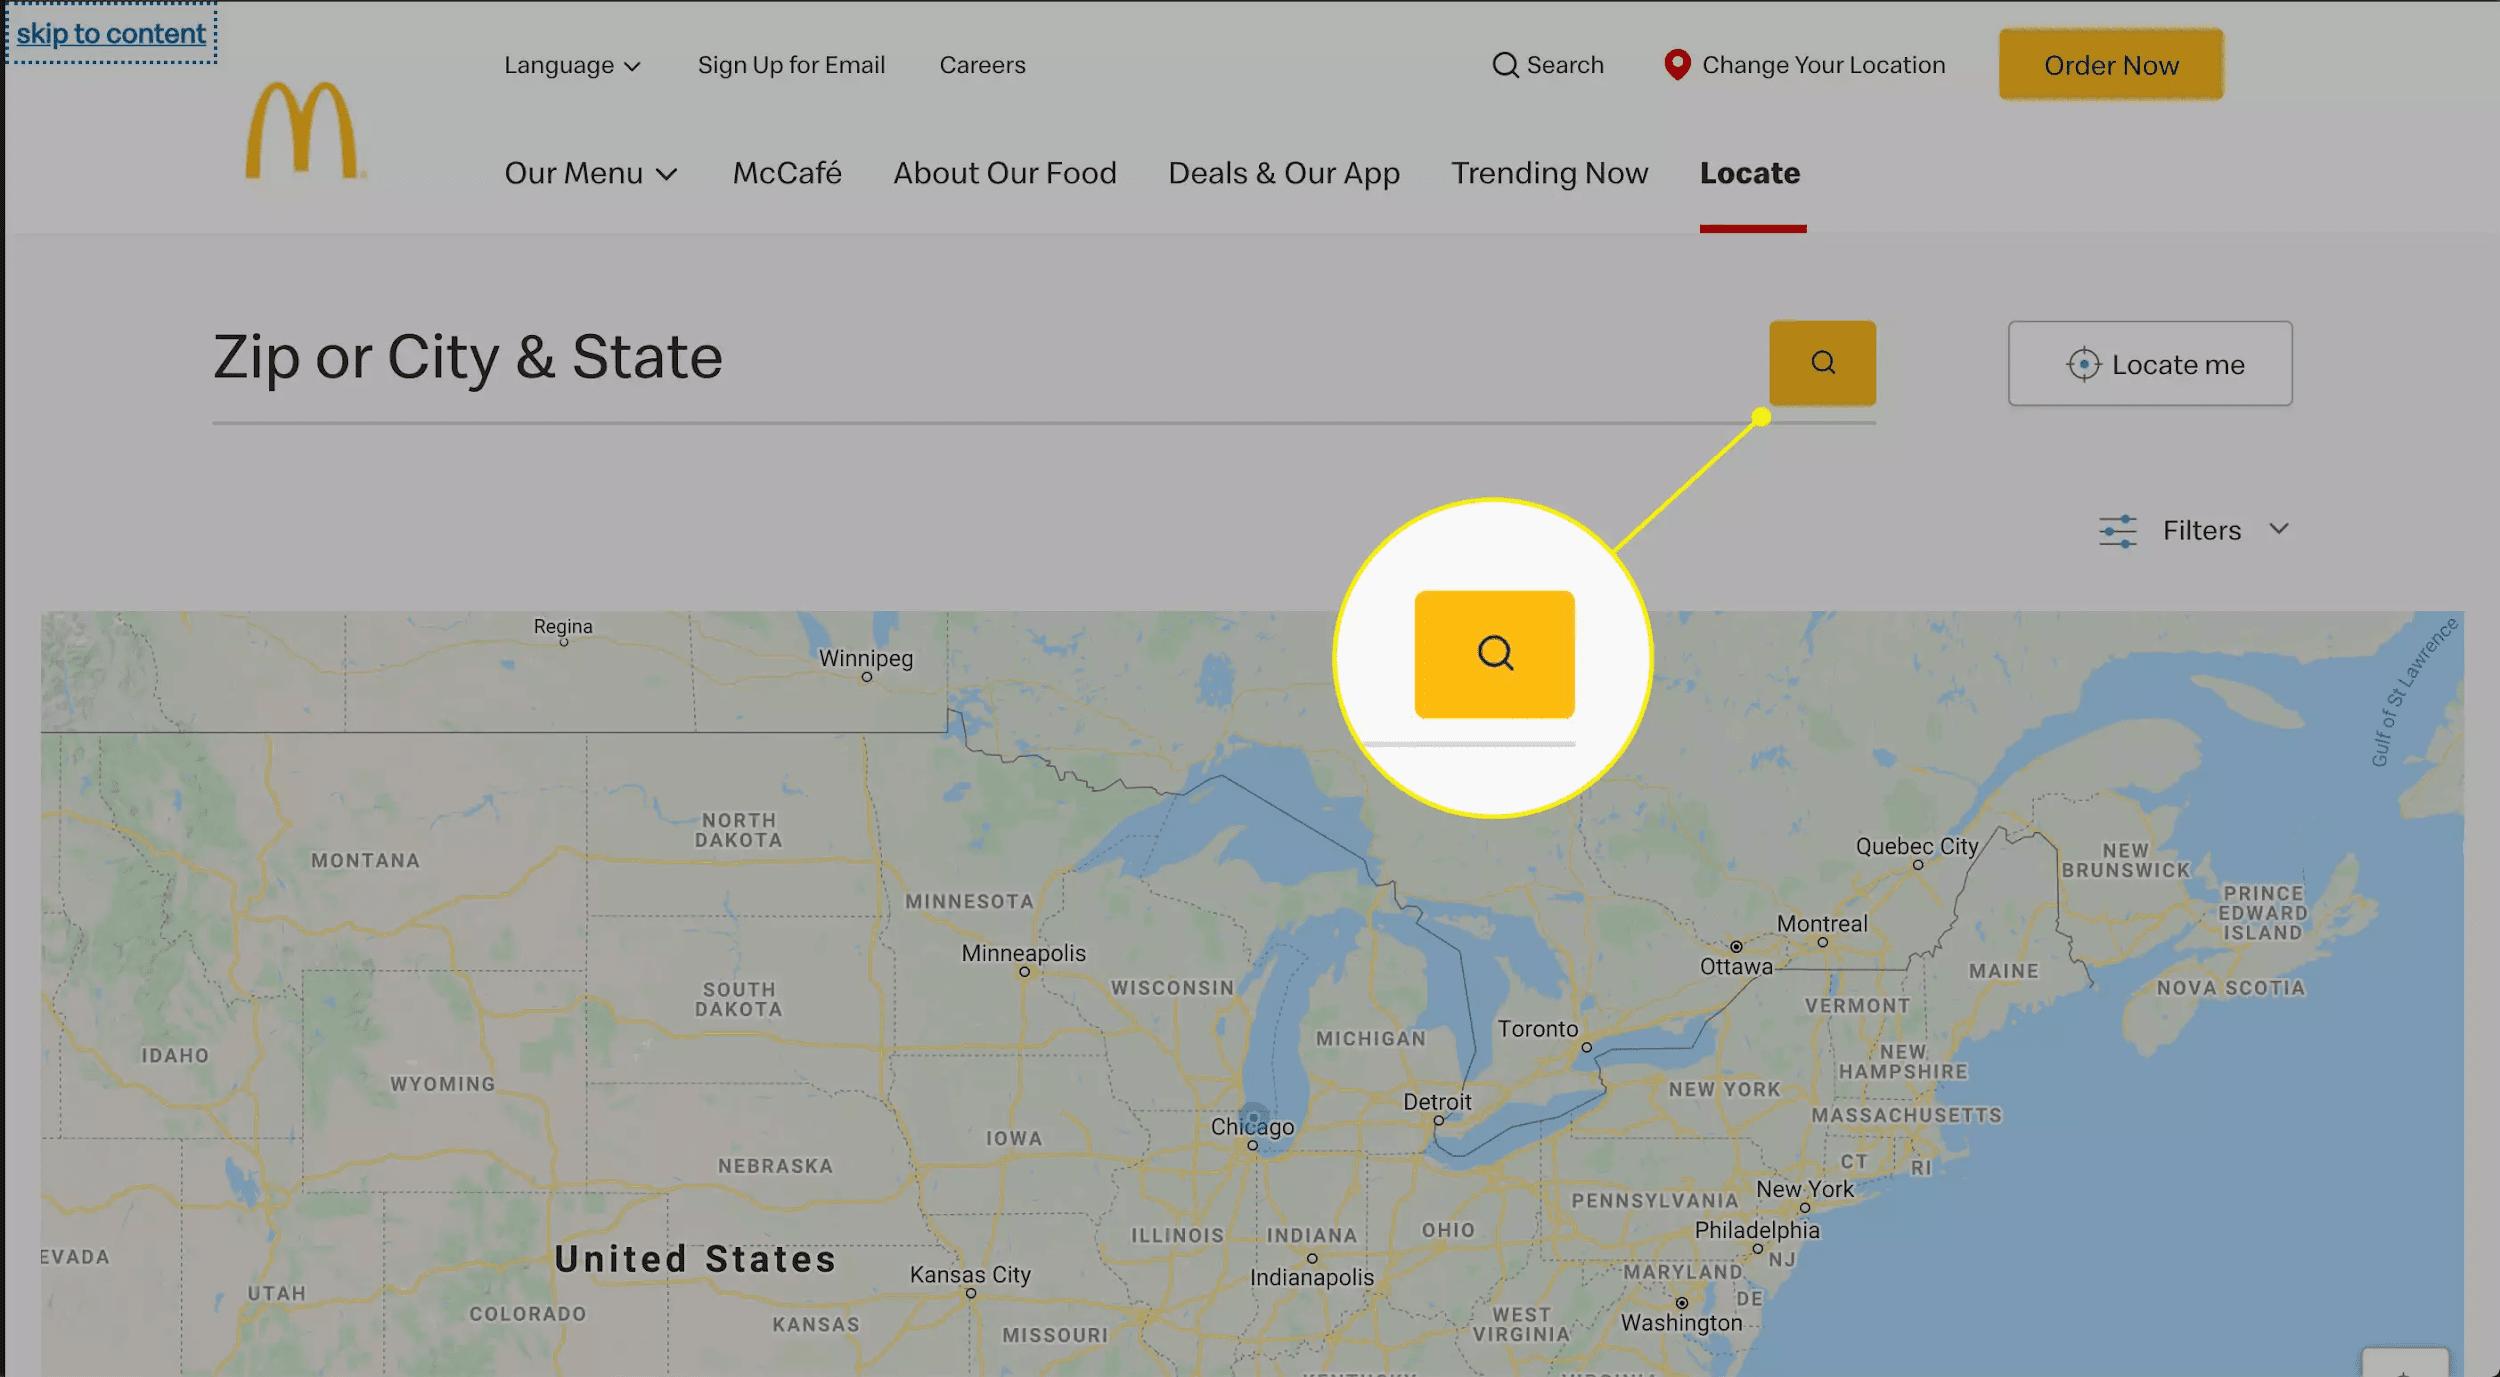 McDonald's locator page